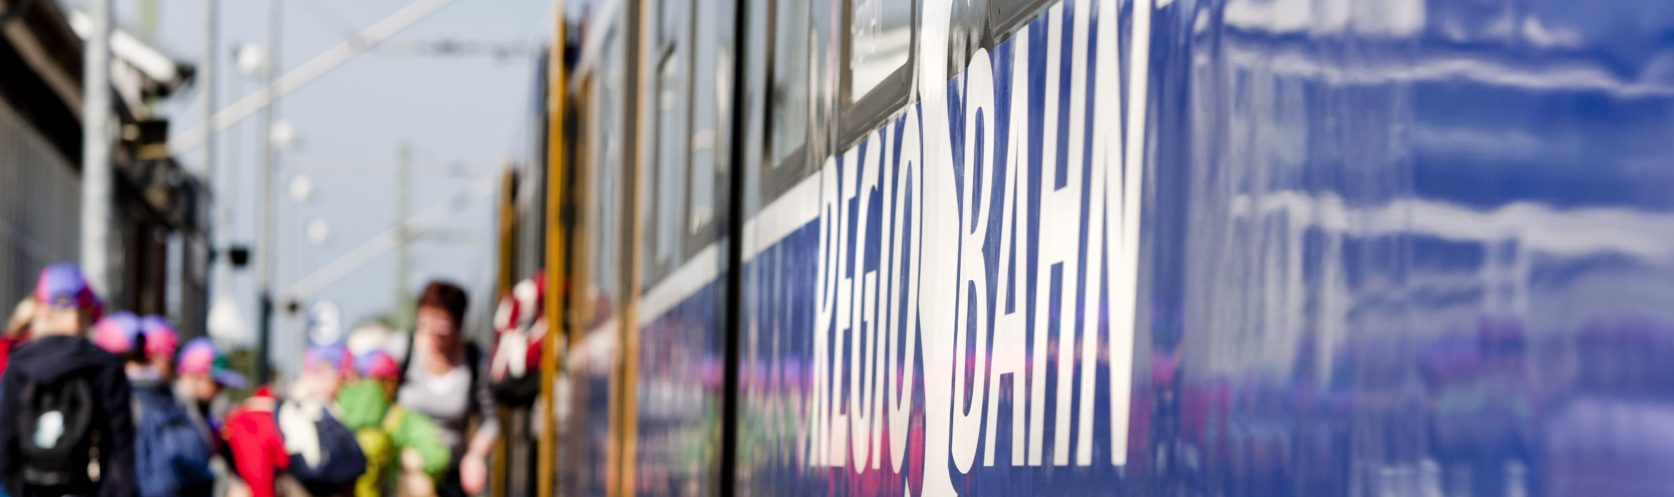 transdev train ferroviaire allemagne basse saxe transdev mobilité regio s bahn